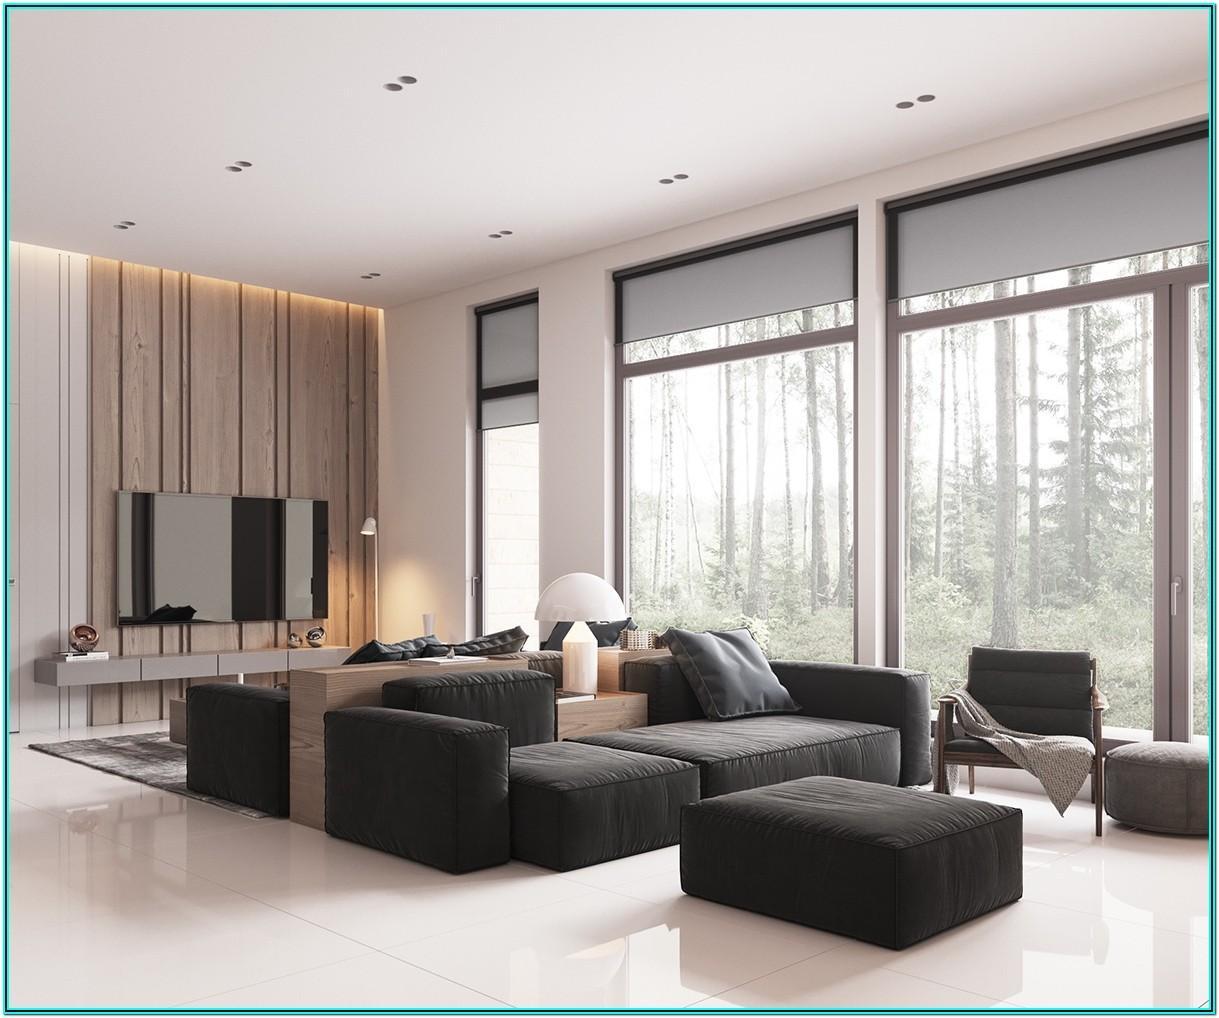 Minimalist Interior Design Ideas For Small Living Room